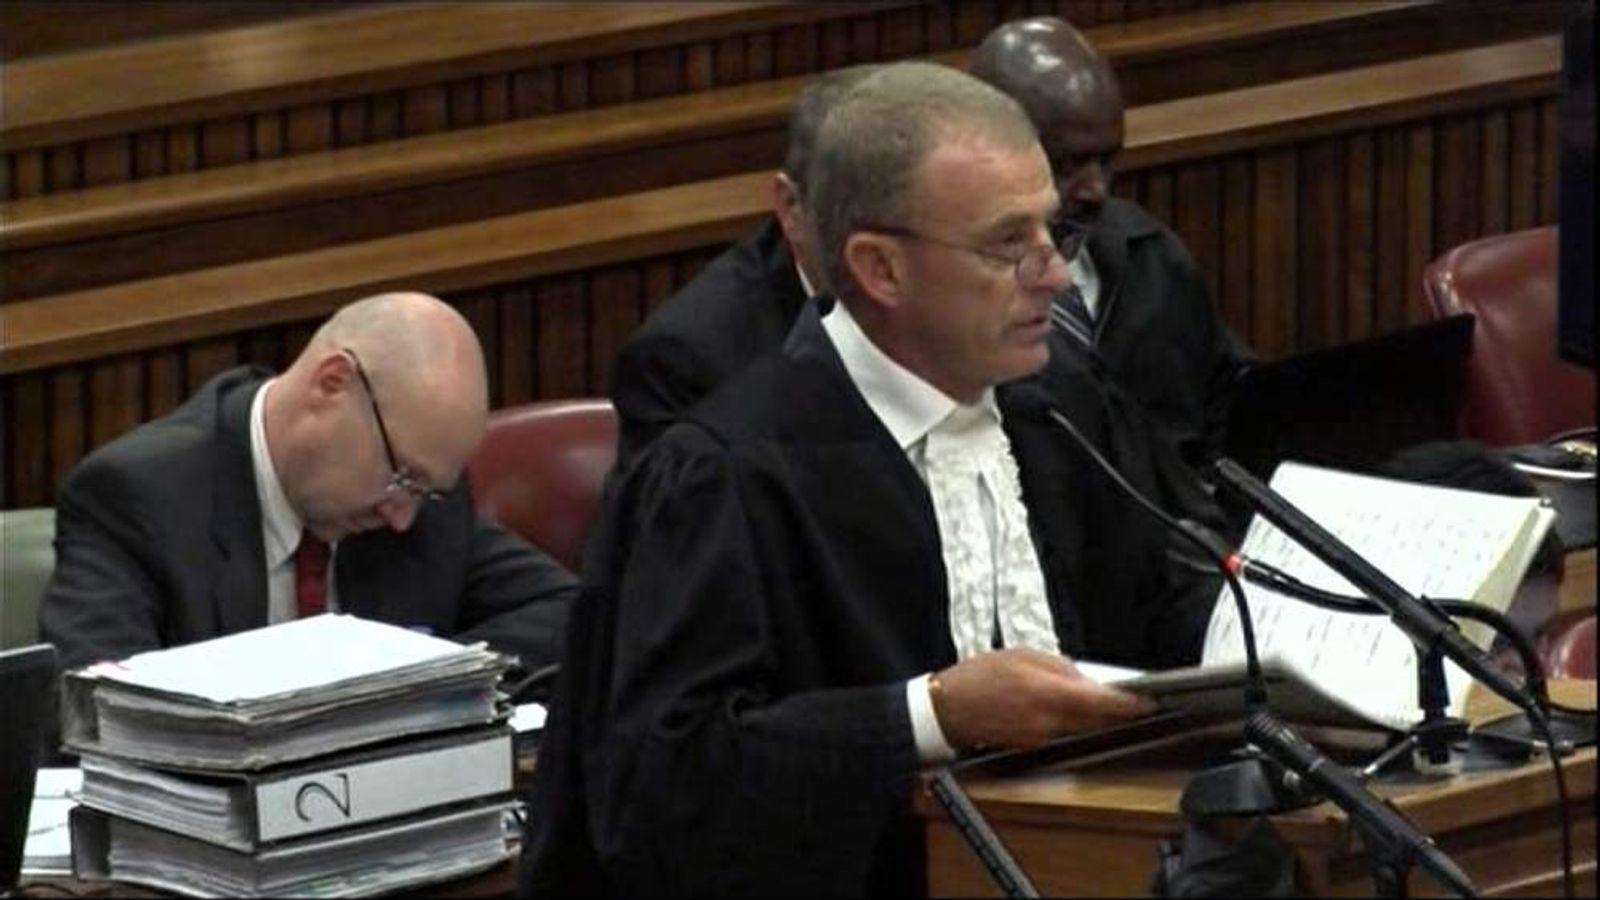 Gerrie Nel ends his cross-examination of Oscar Pistorius